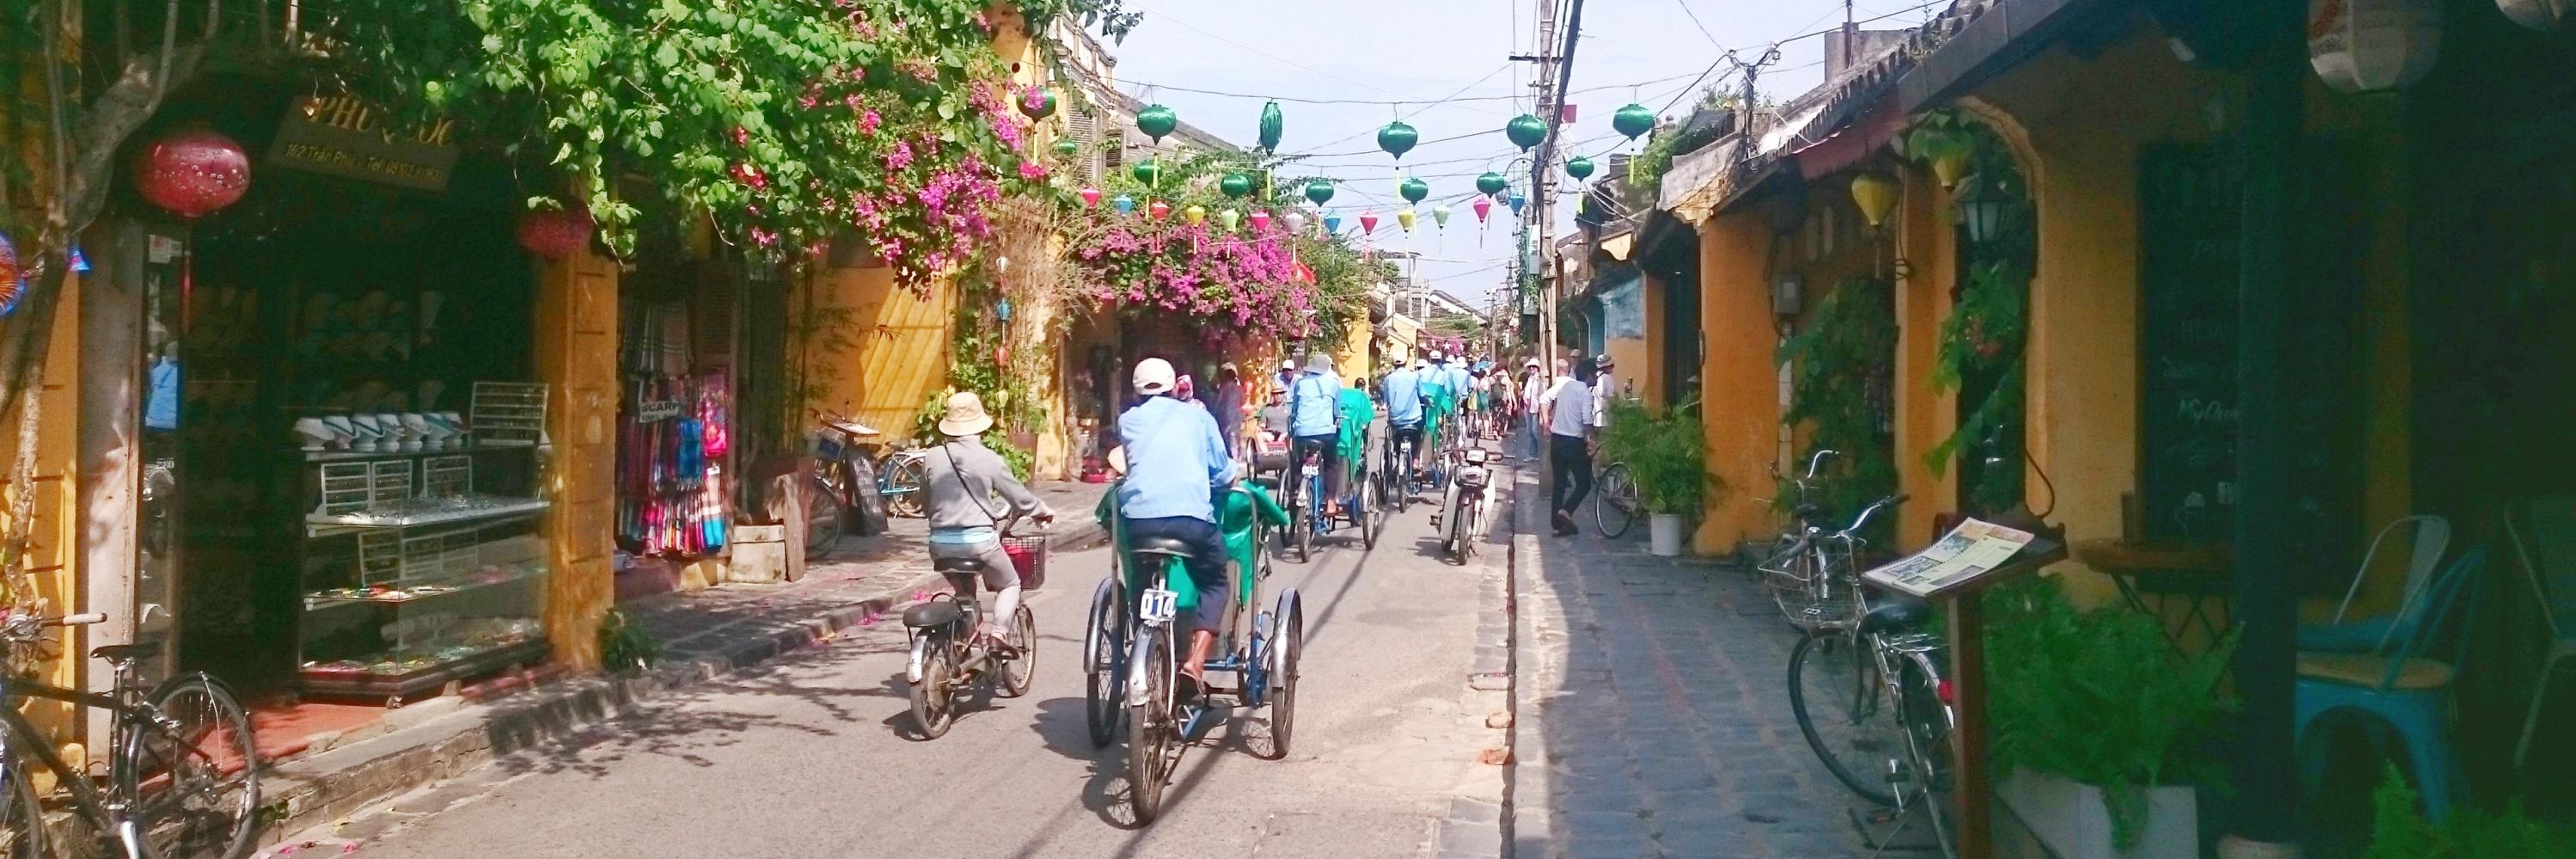 https://gody.vn/blog/trhgvhung.fa1924/post/vietnamsolo-hoi-an-dem-hoai-pho-hoi-956